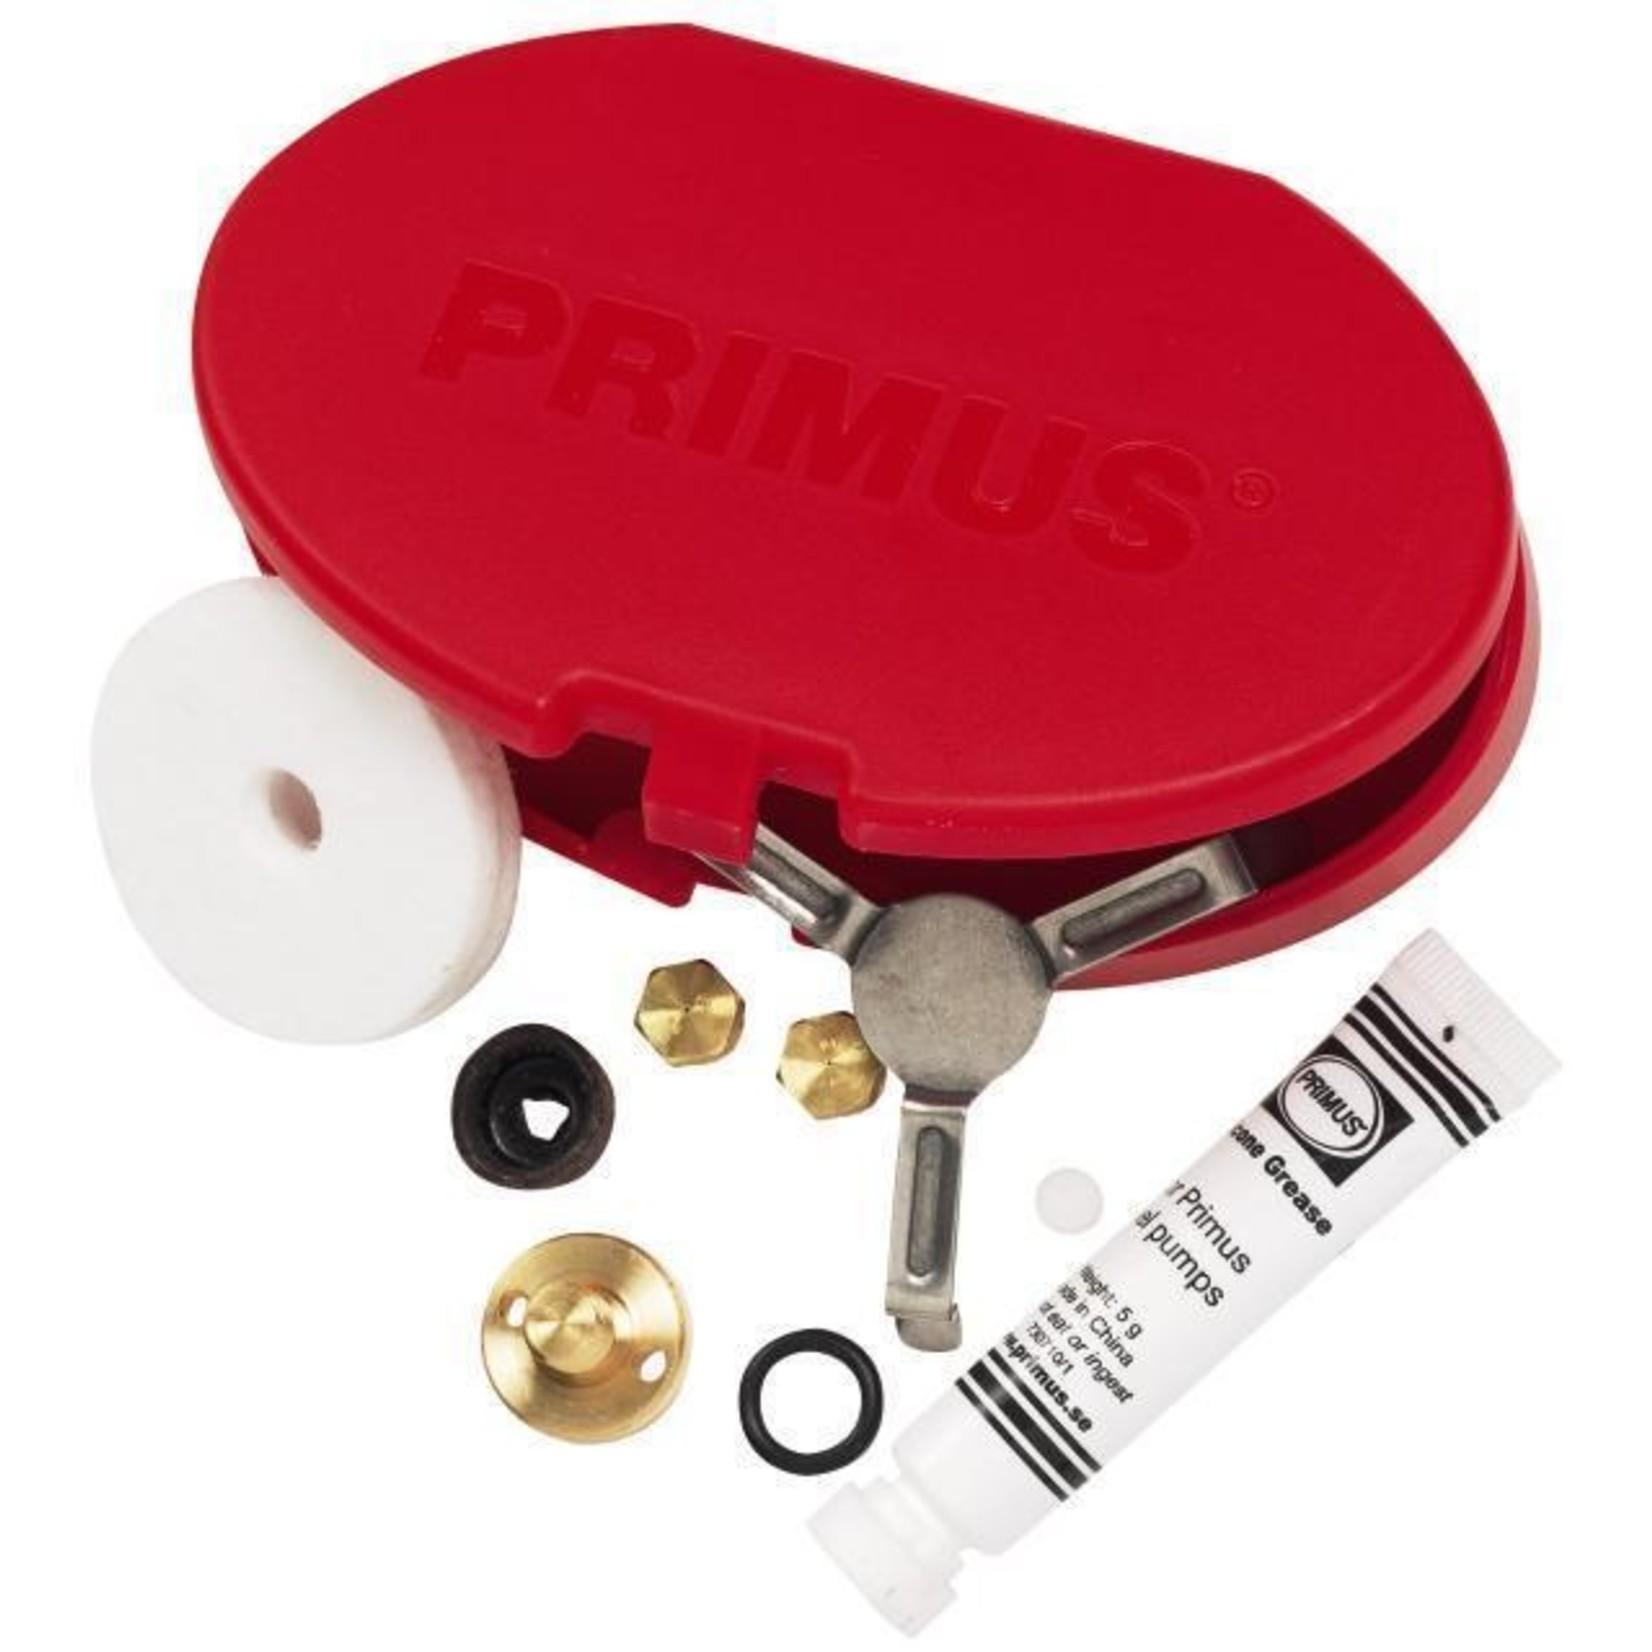 Primus Primus OmniFuel service kit voor OmniFuel en MultifuelEX